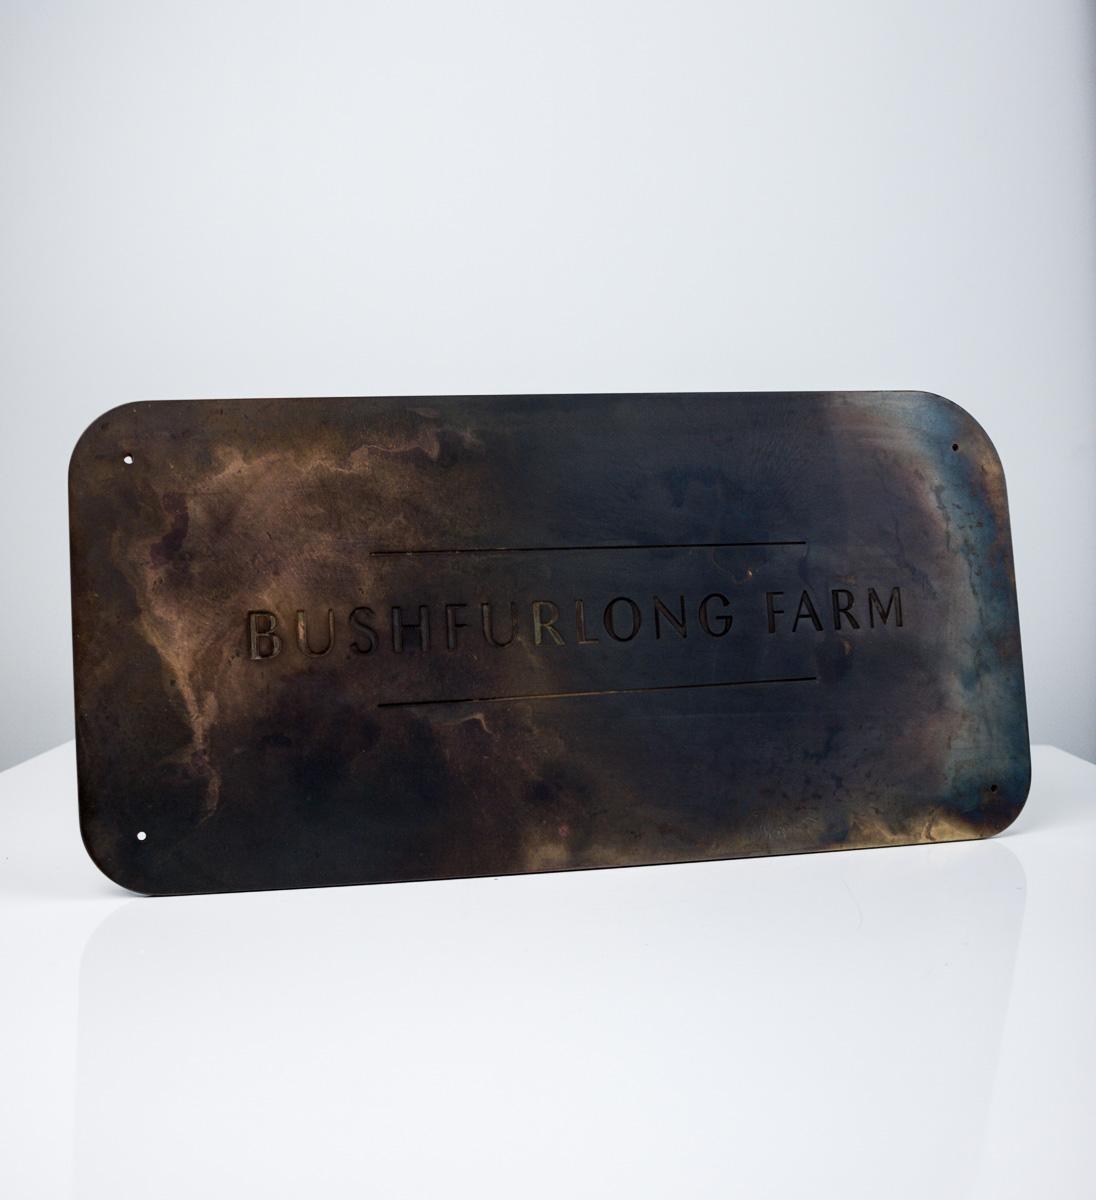 Bushfurlong Farm Patinated Brass Entry Signage